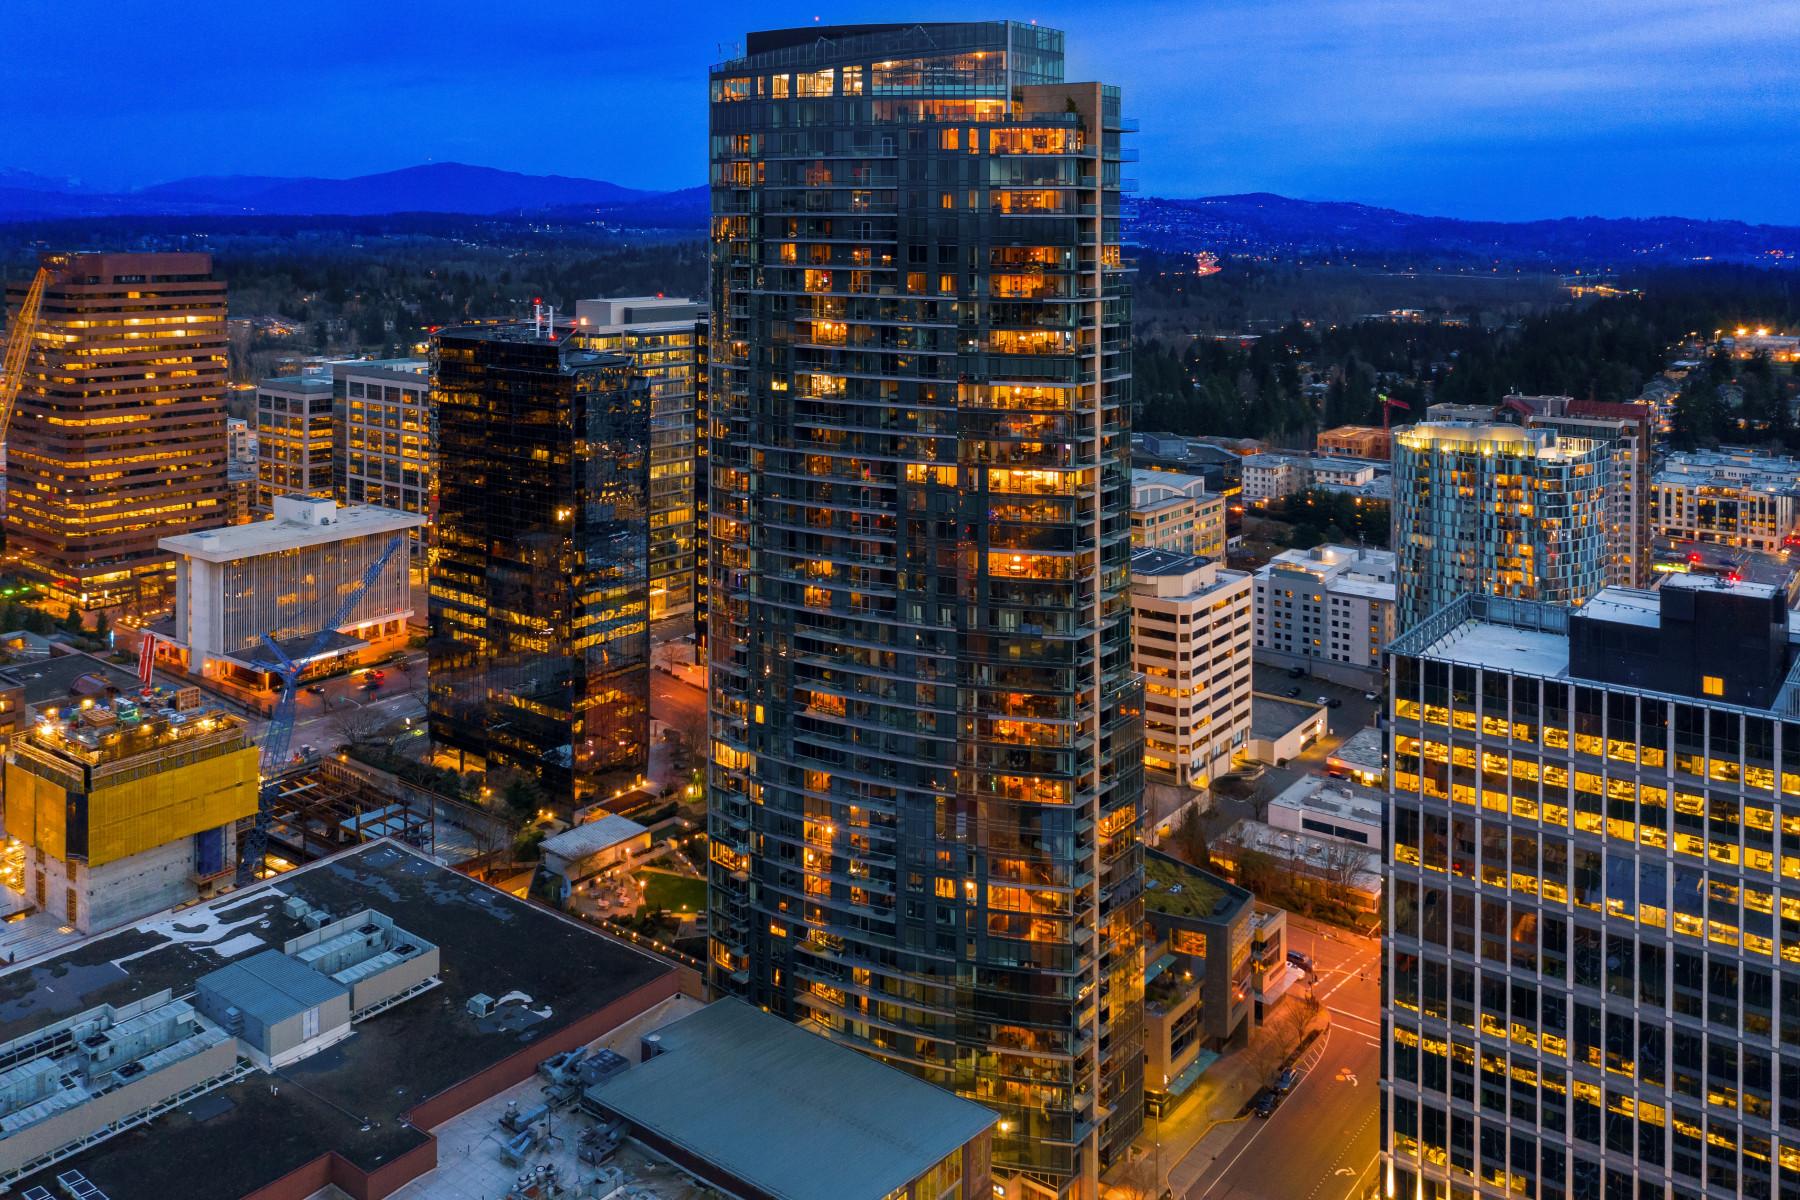 500 106th Ave NE #2801, Bellevue | Represented by Michele Schuler